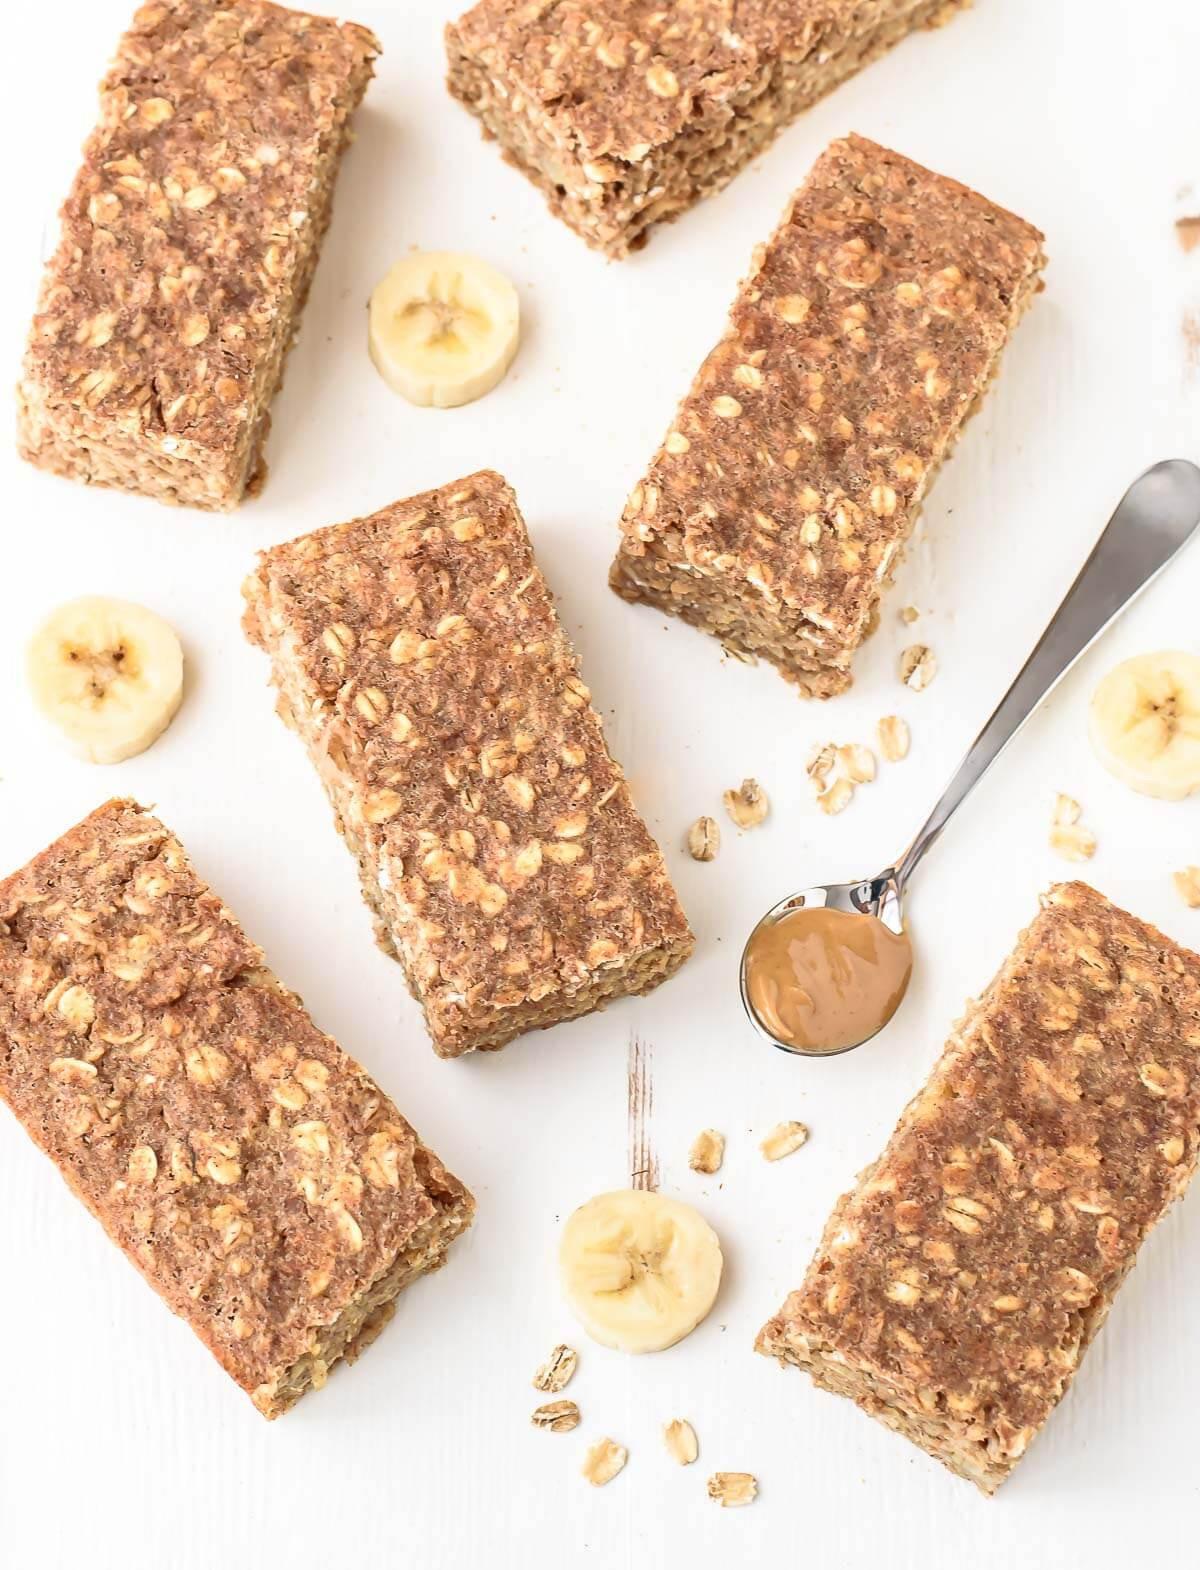 Best Healthy Breakfast Bars  15 Healthy Homemade Snack Bars